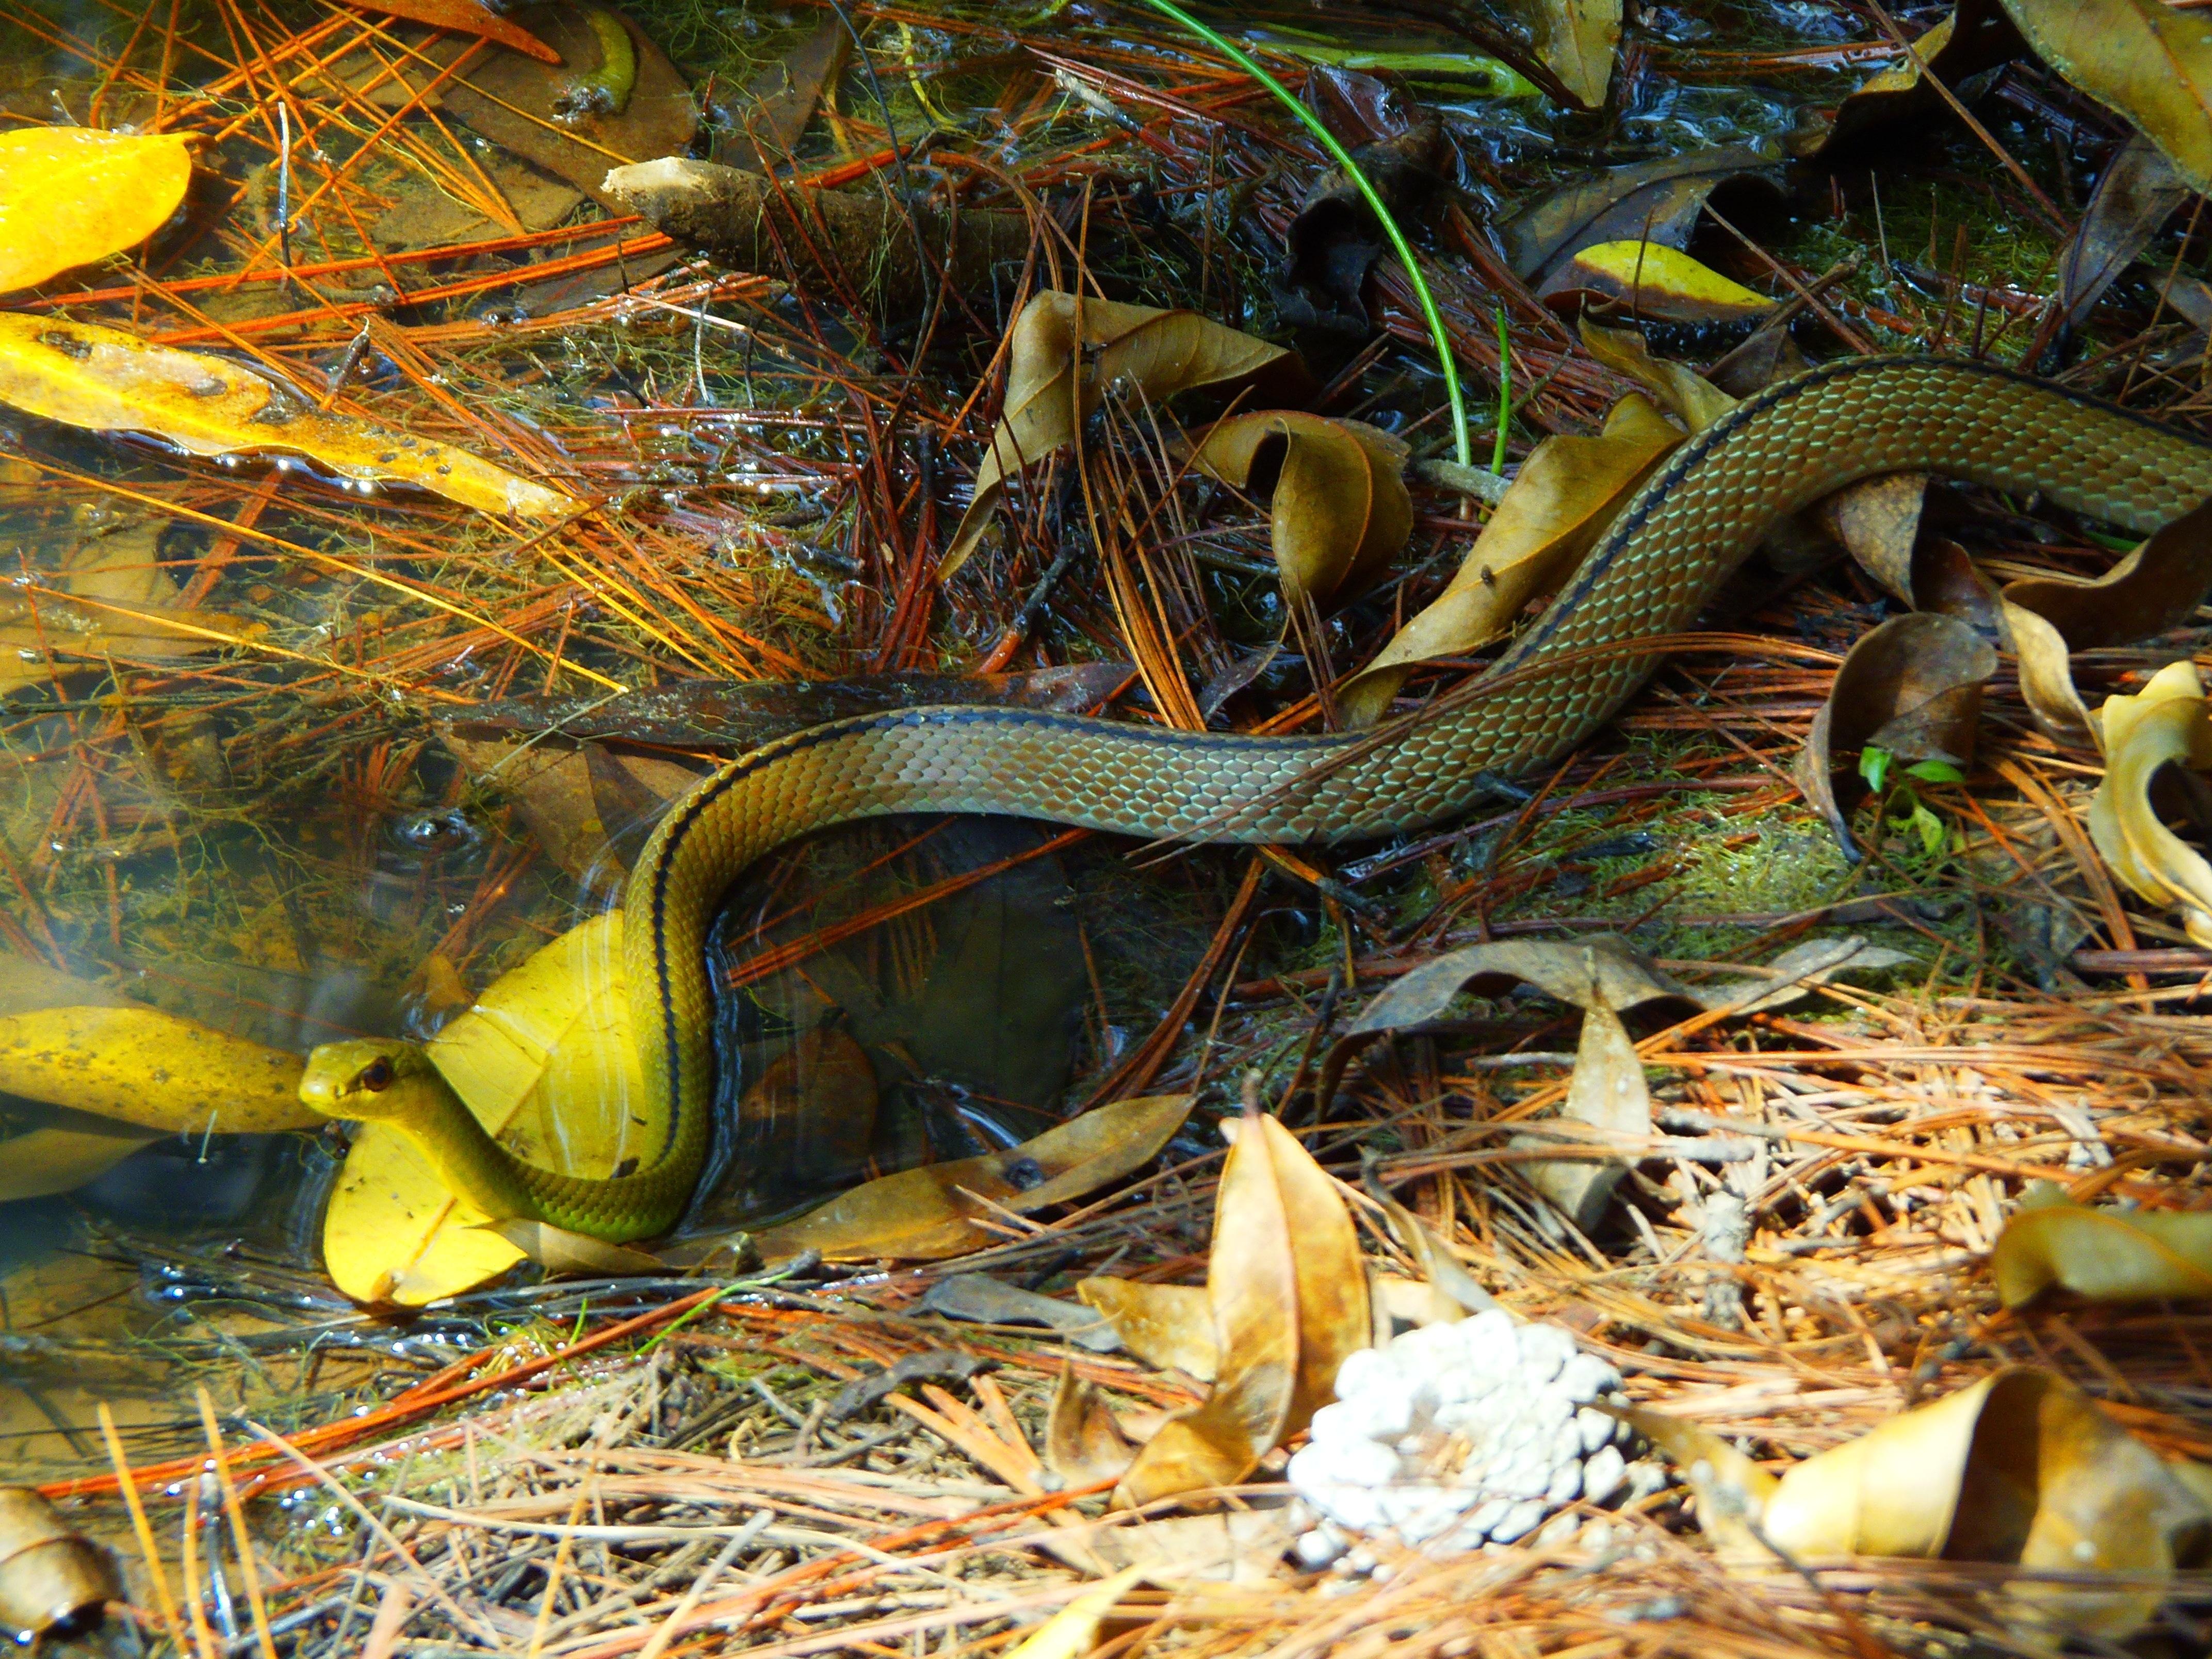 Free Images : nature, animal, wildlife, reptile, fauna, animals ...